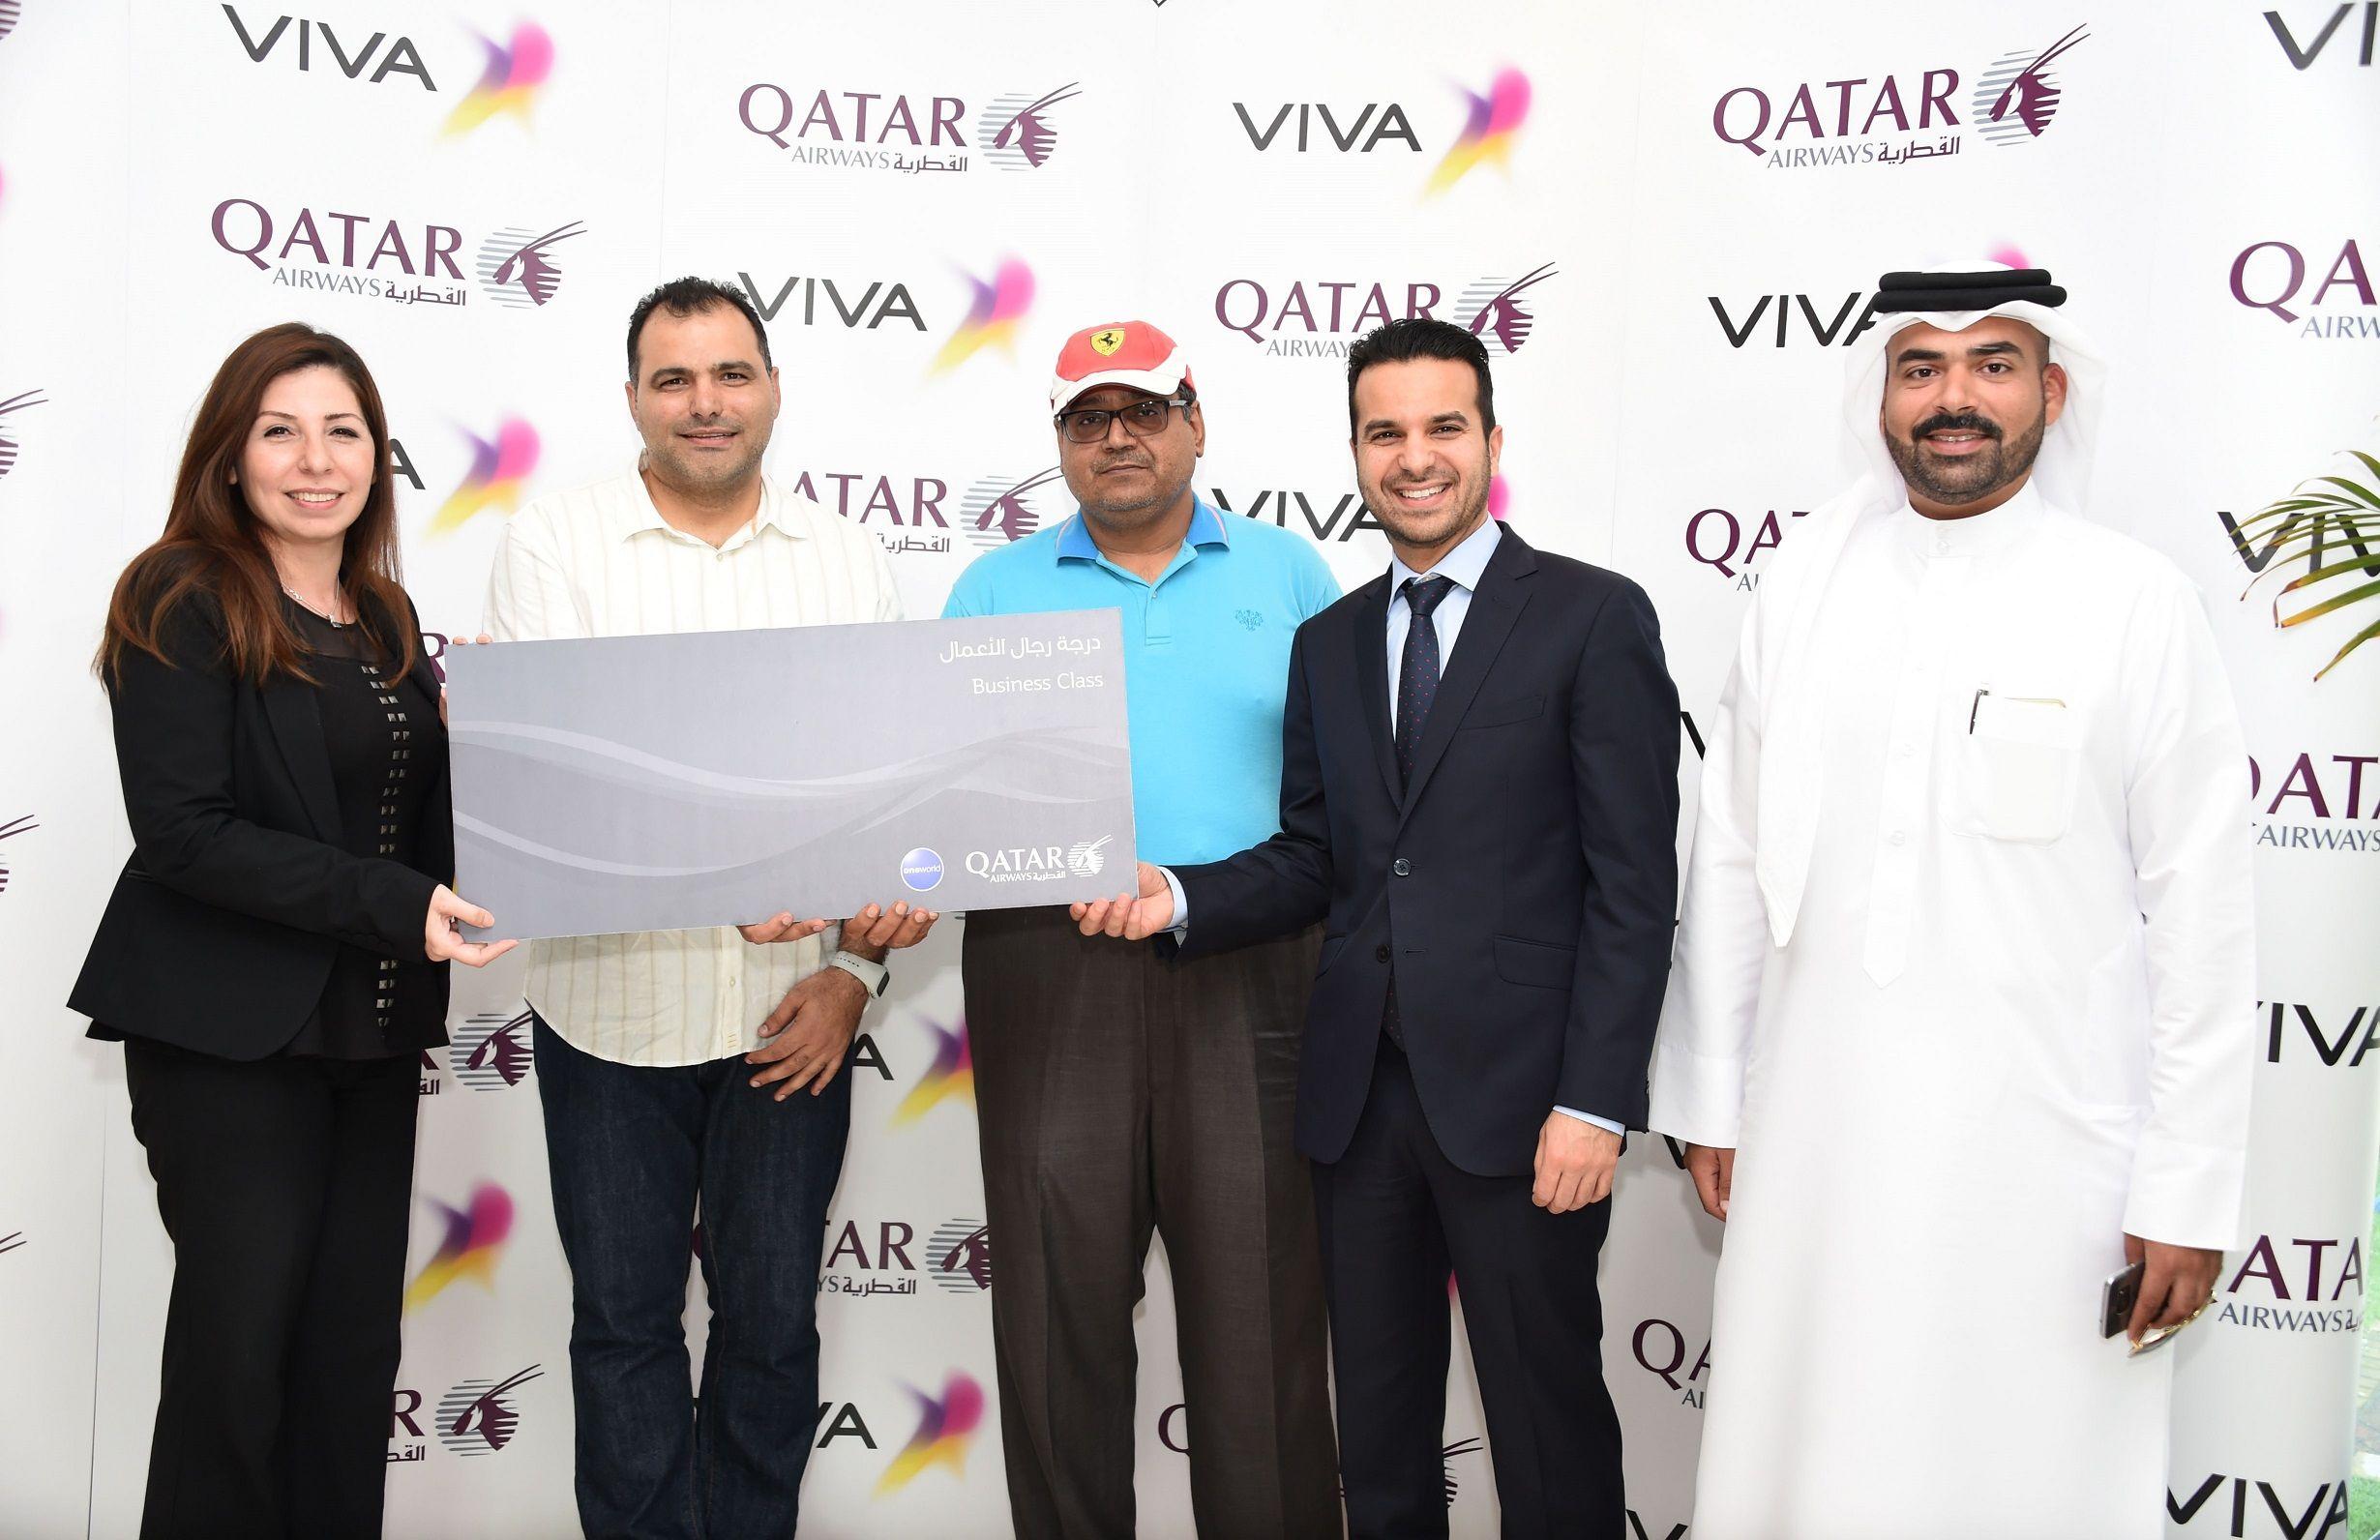 VIVA Bahrain successfully concluded its VIVA Rewards